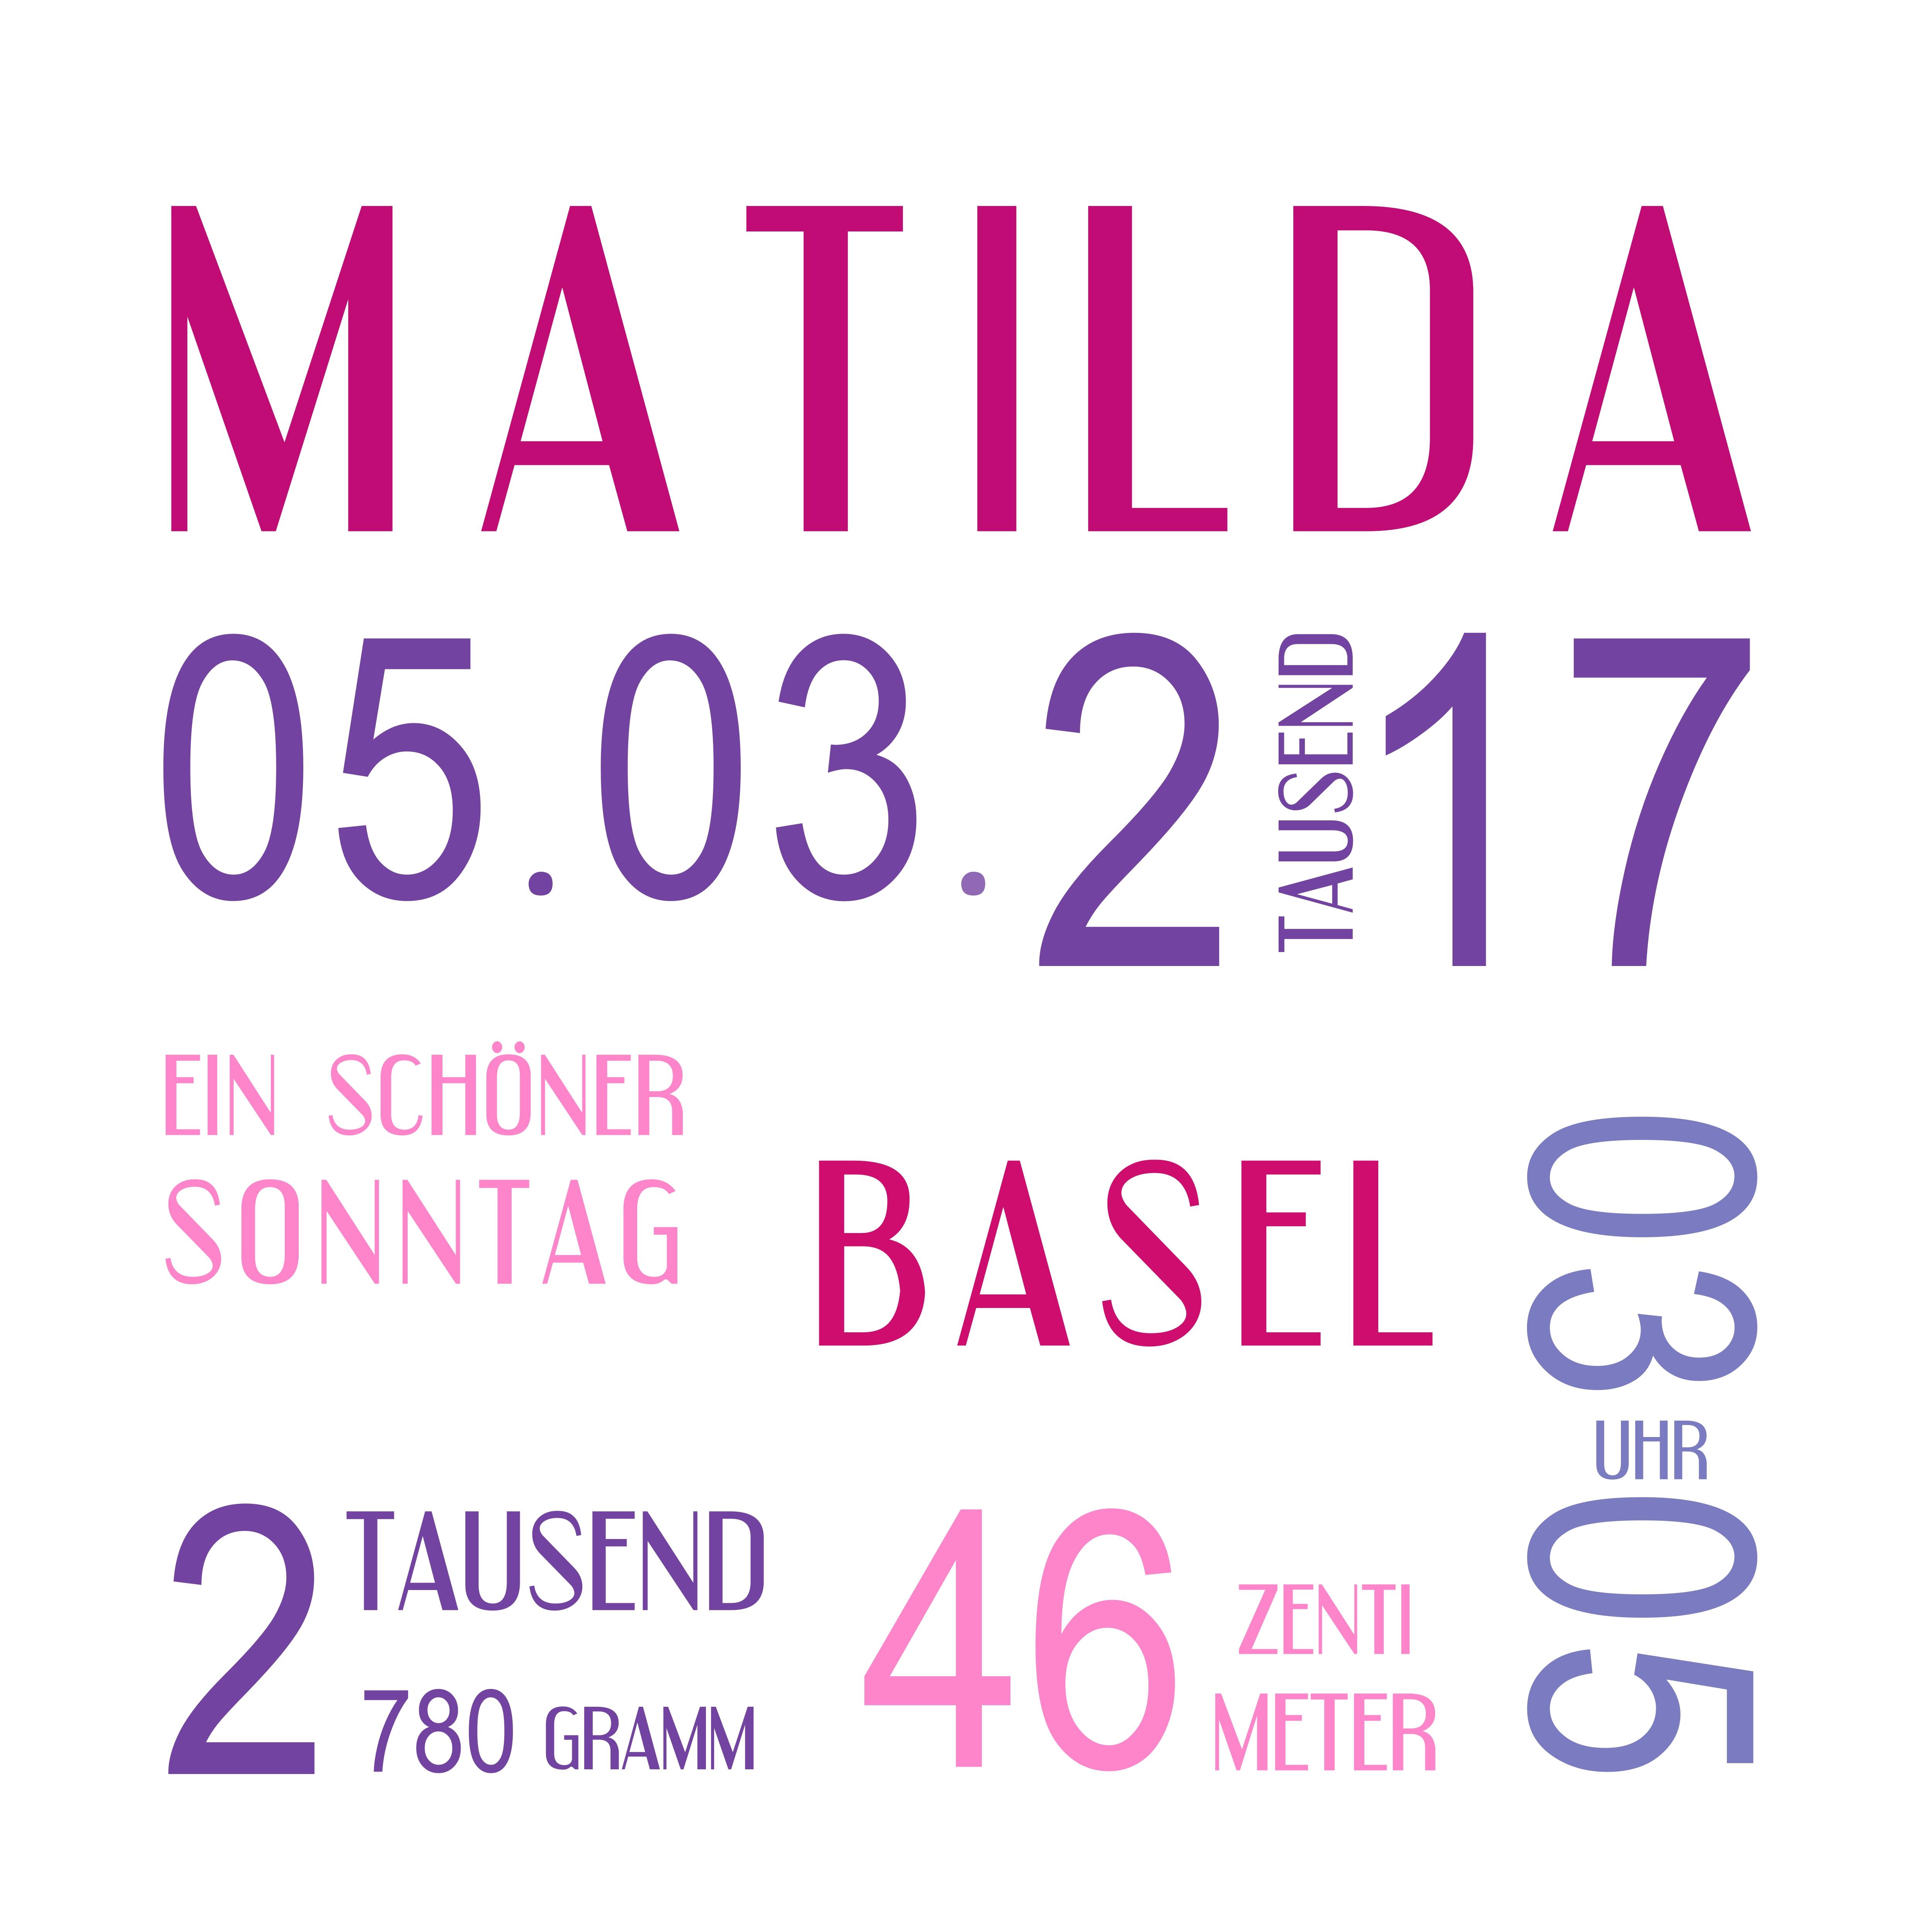 Muster Geburt Matilda